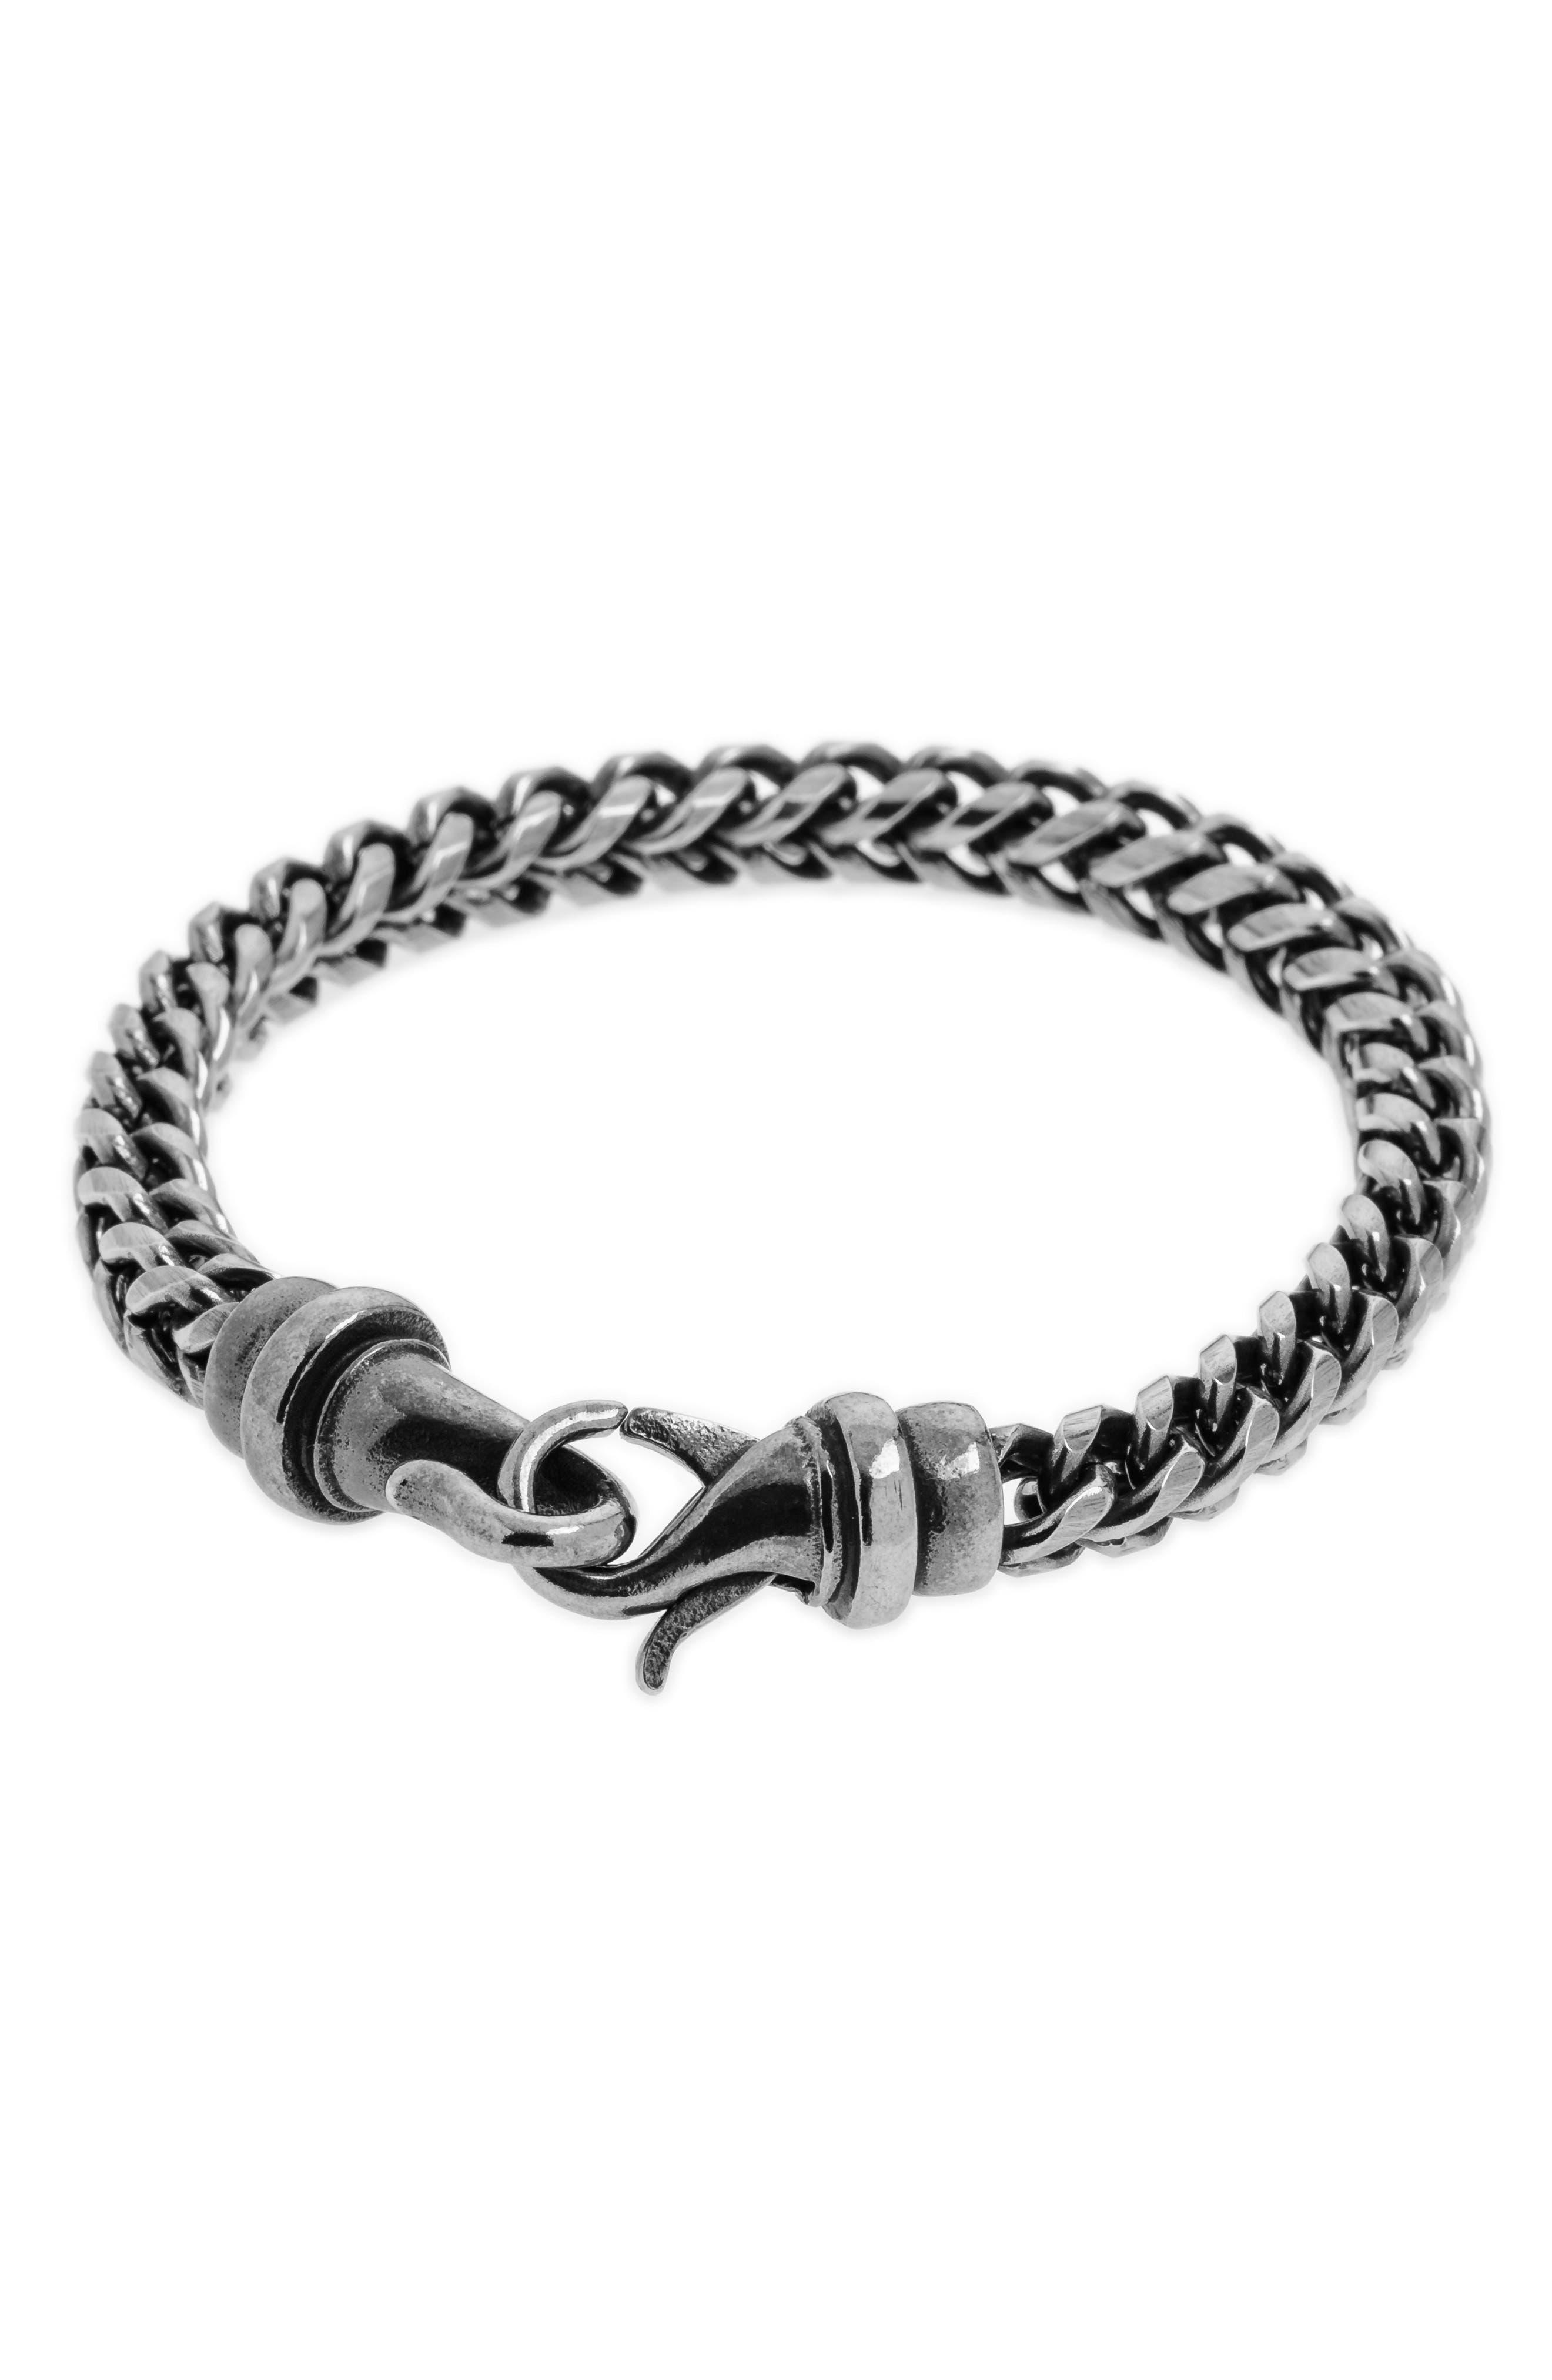 Kusari Chain Bracelet,                         Main,                         color, Antiqued Steel